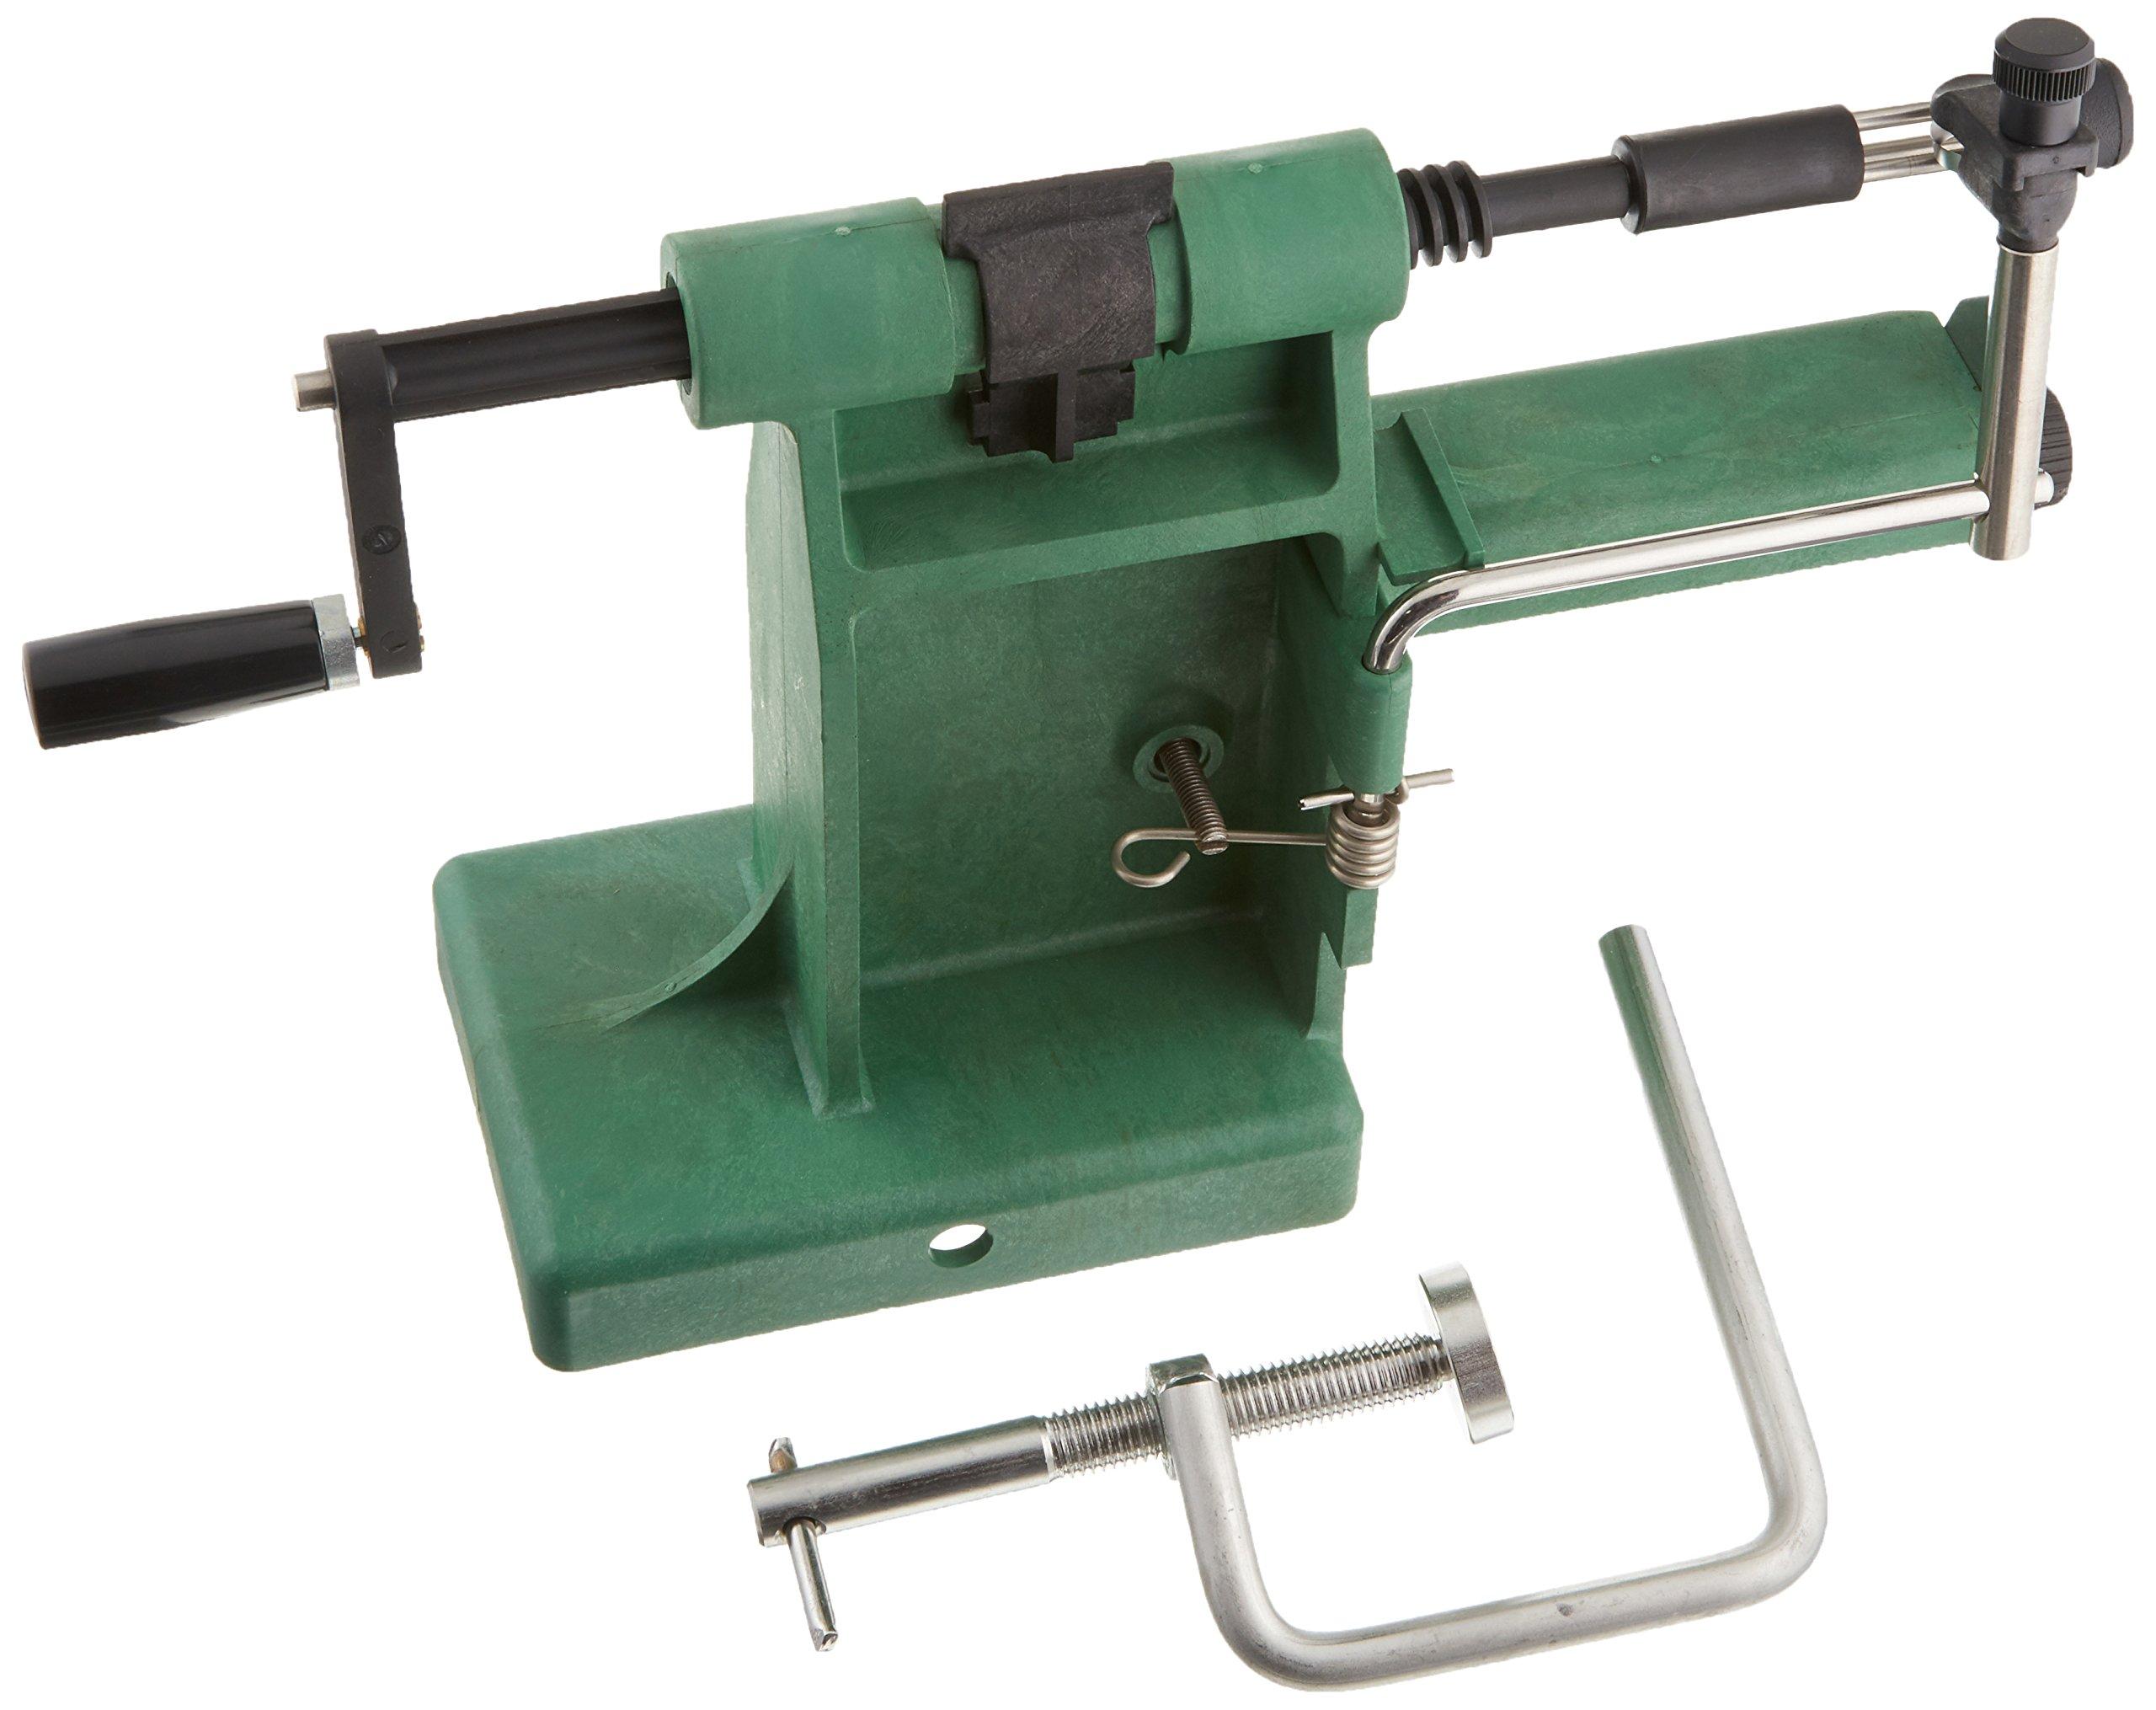 Matfer Bourgeat 215250 Apple Peeler/ Slicer/ Corer